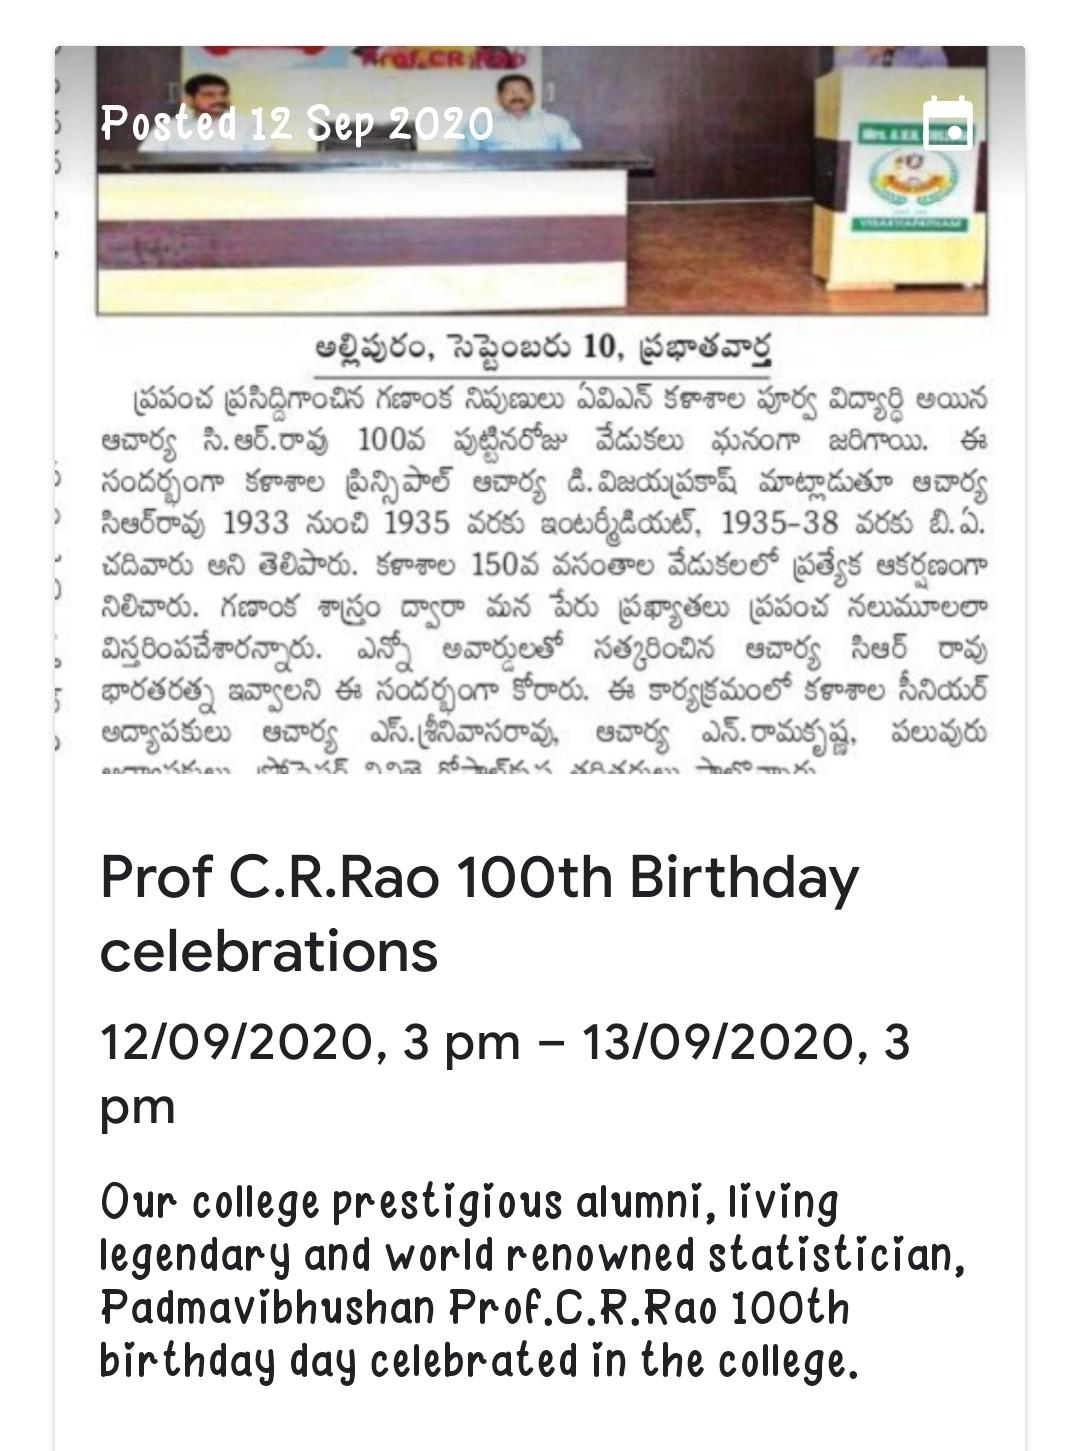 Prof.C.R.Rao centenary birth day celebrations